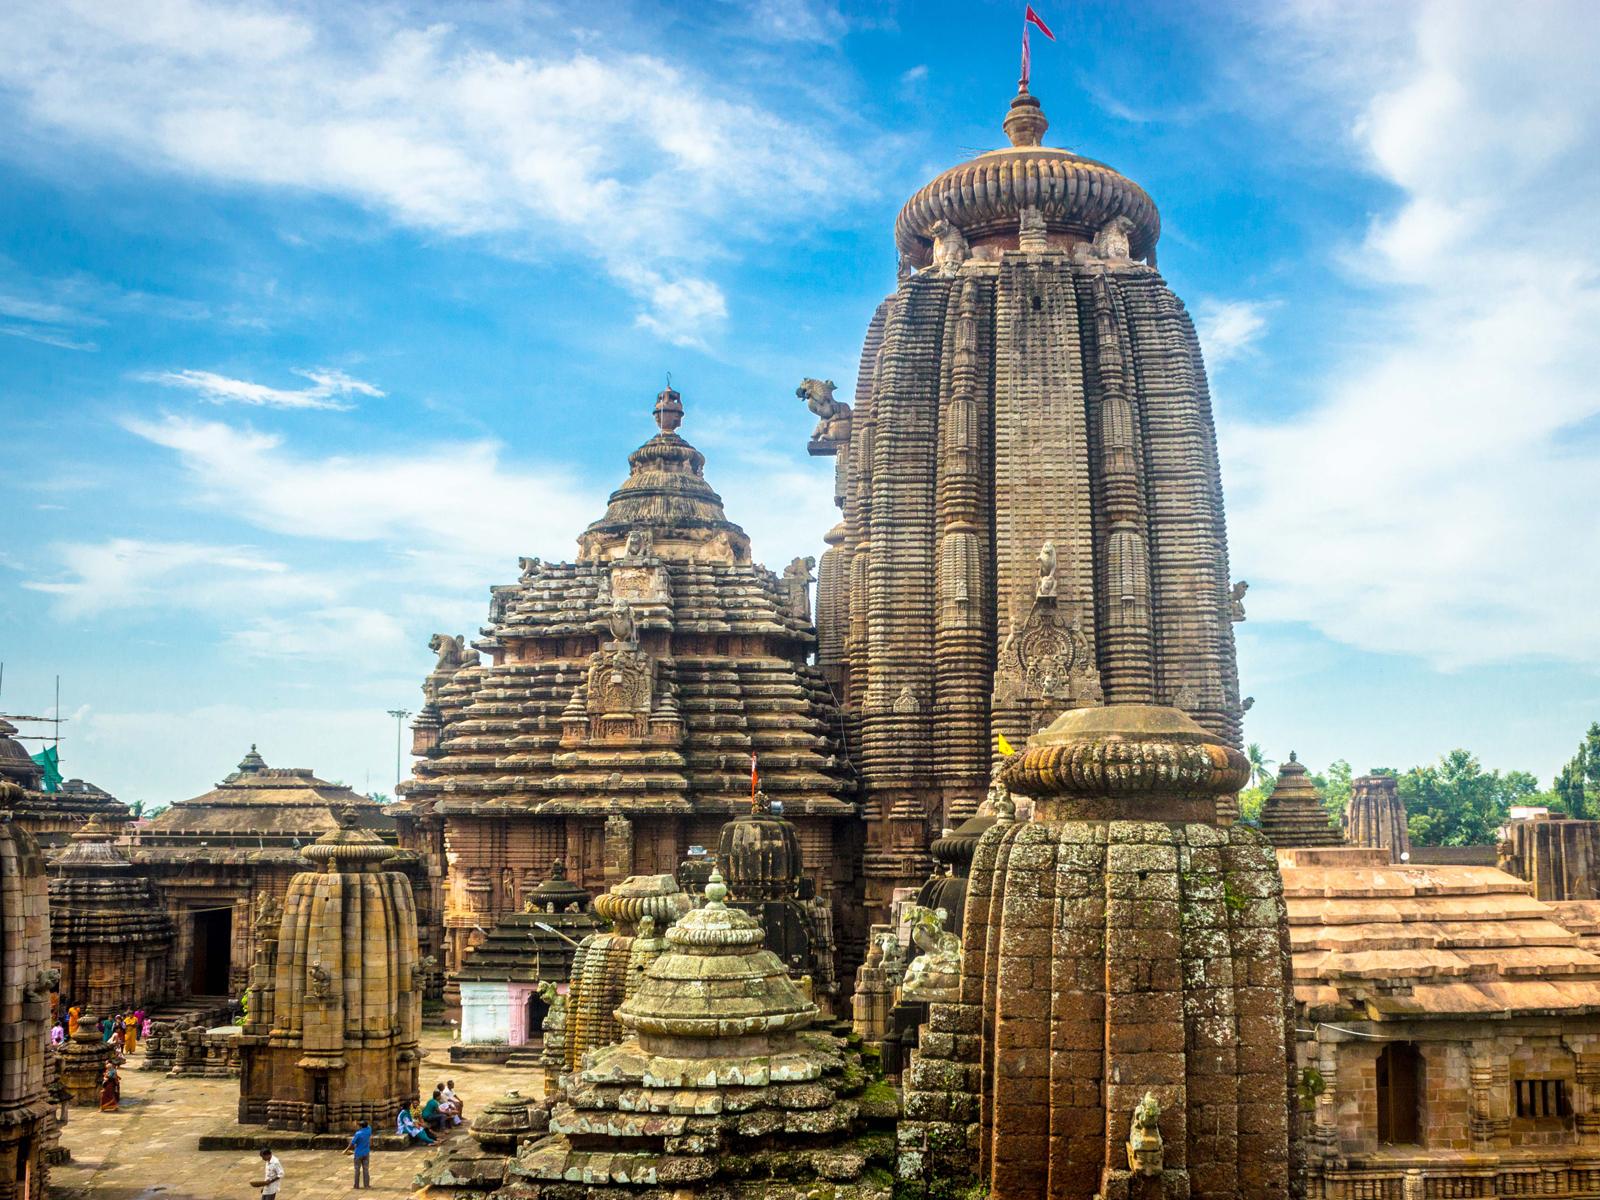 Lingaraj Temple Bhubaneswar